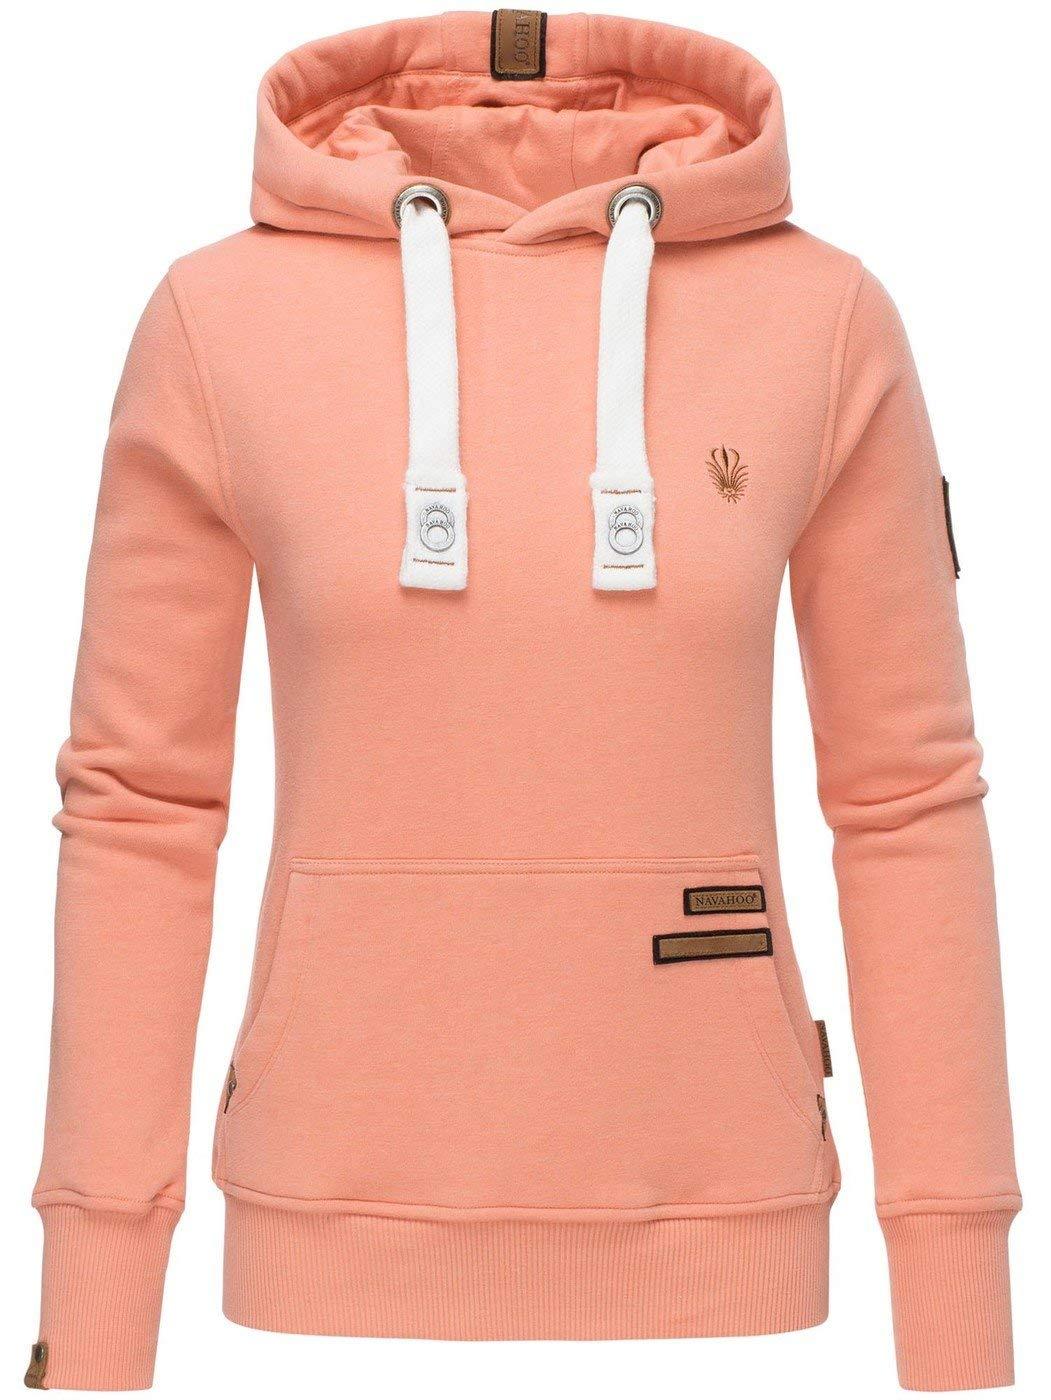 Navahoo Damen Sweatshirt Hoodie Pullover Pulli Sweater Kapuze warm B686